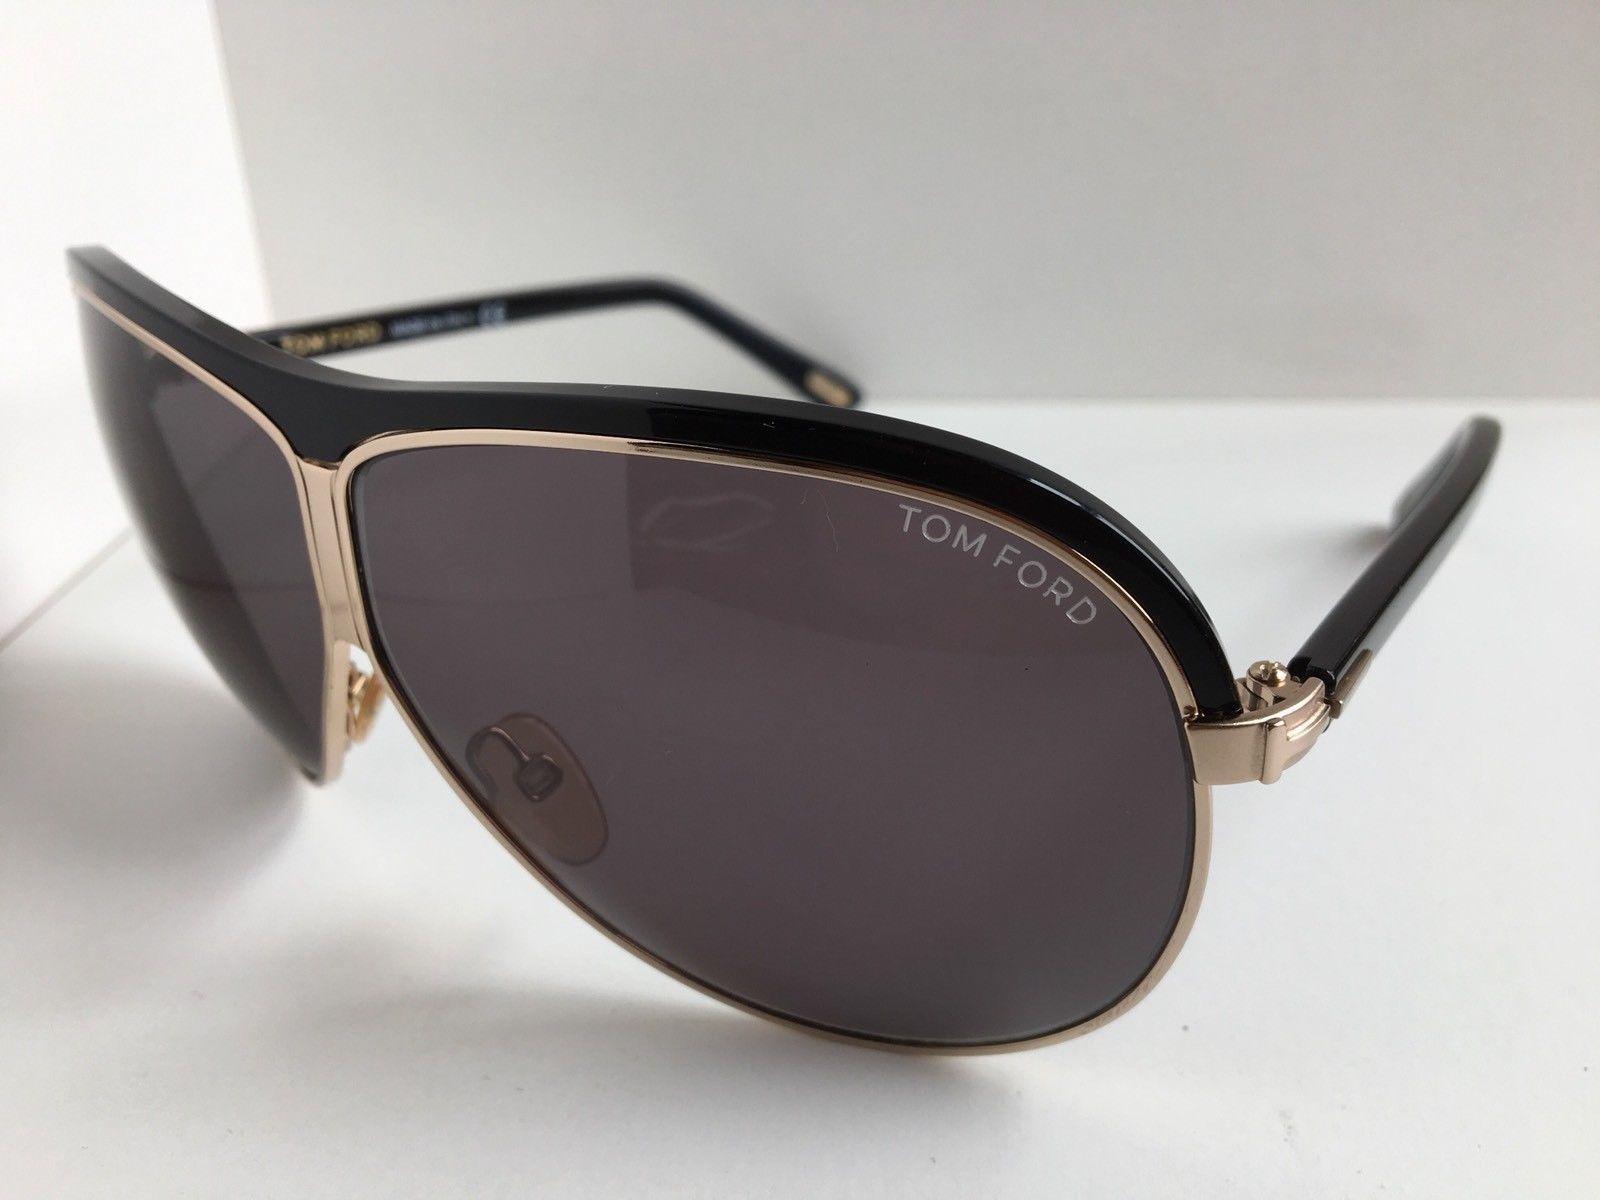 6f1983c8c4d Tom Ford Rory TF 51 TF51 772 Black Gold 67mm and 50 similar items